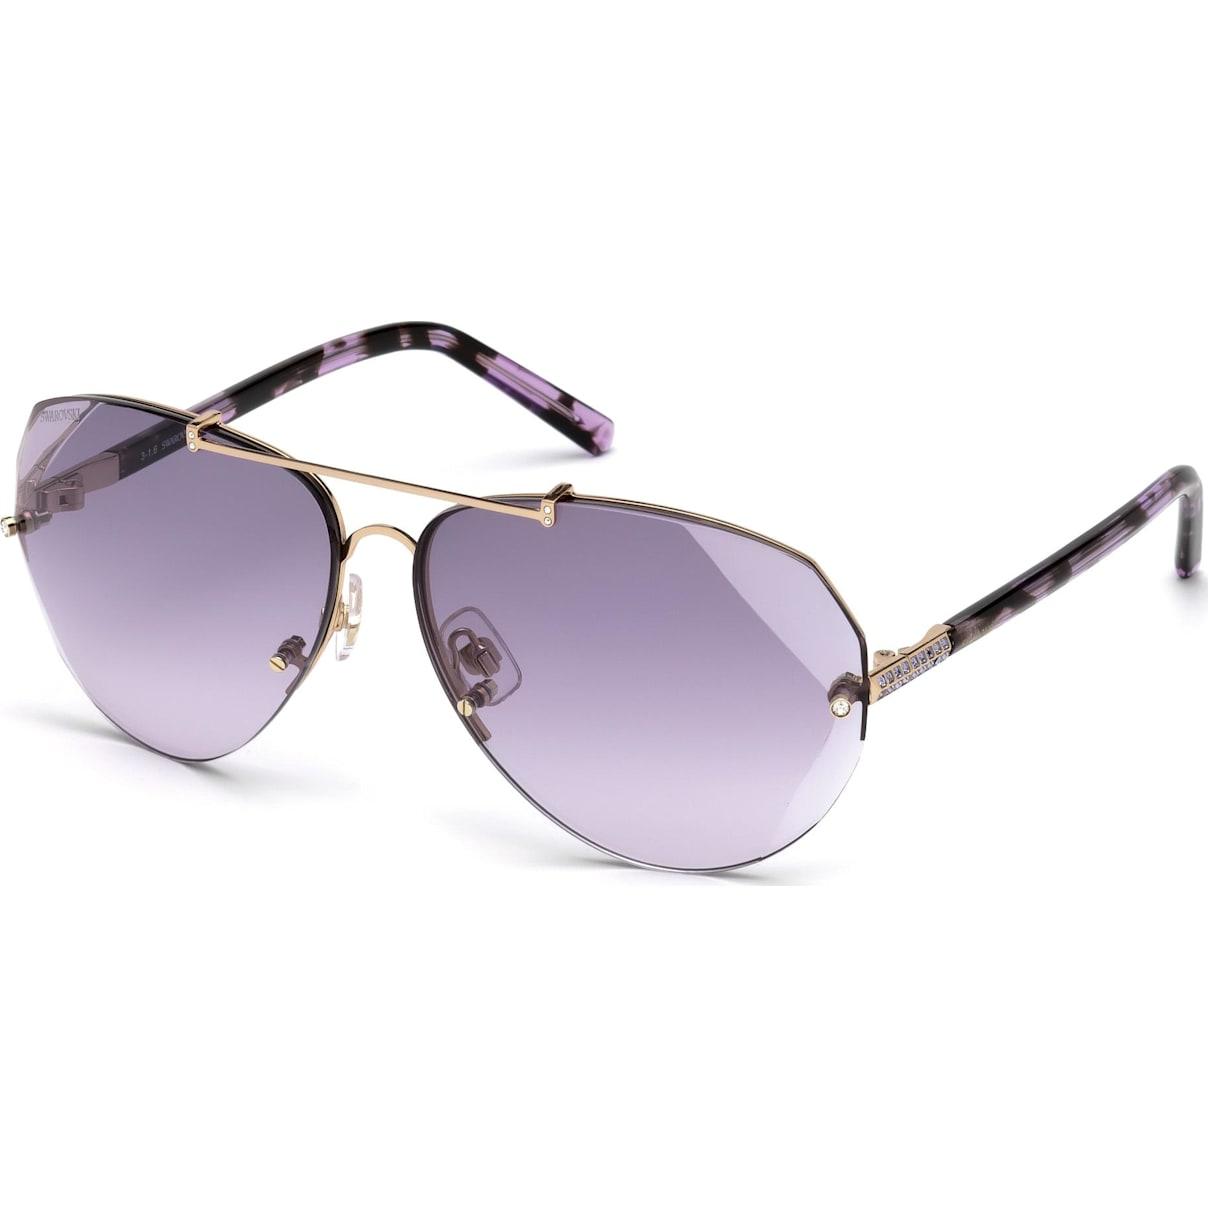 Swarovski Swarovski Sunglasses, SK0134 28Z, Purple